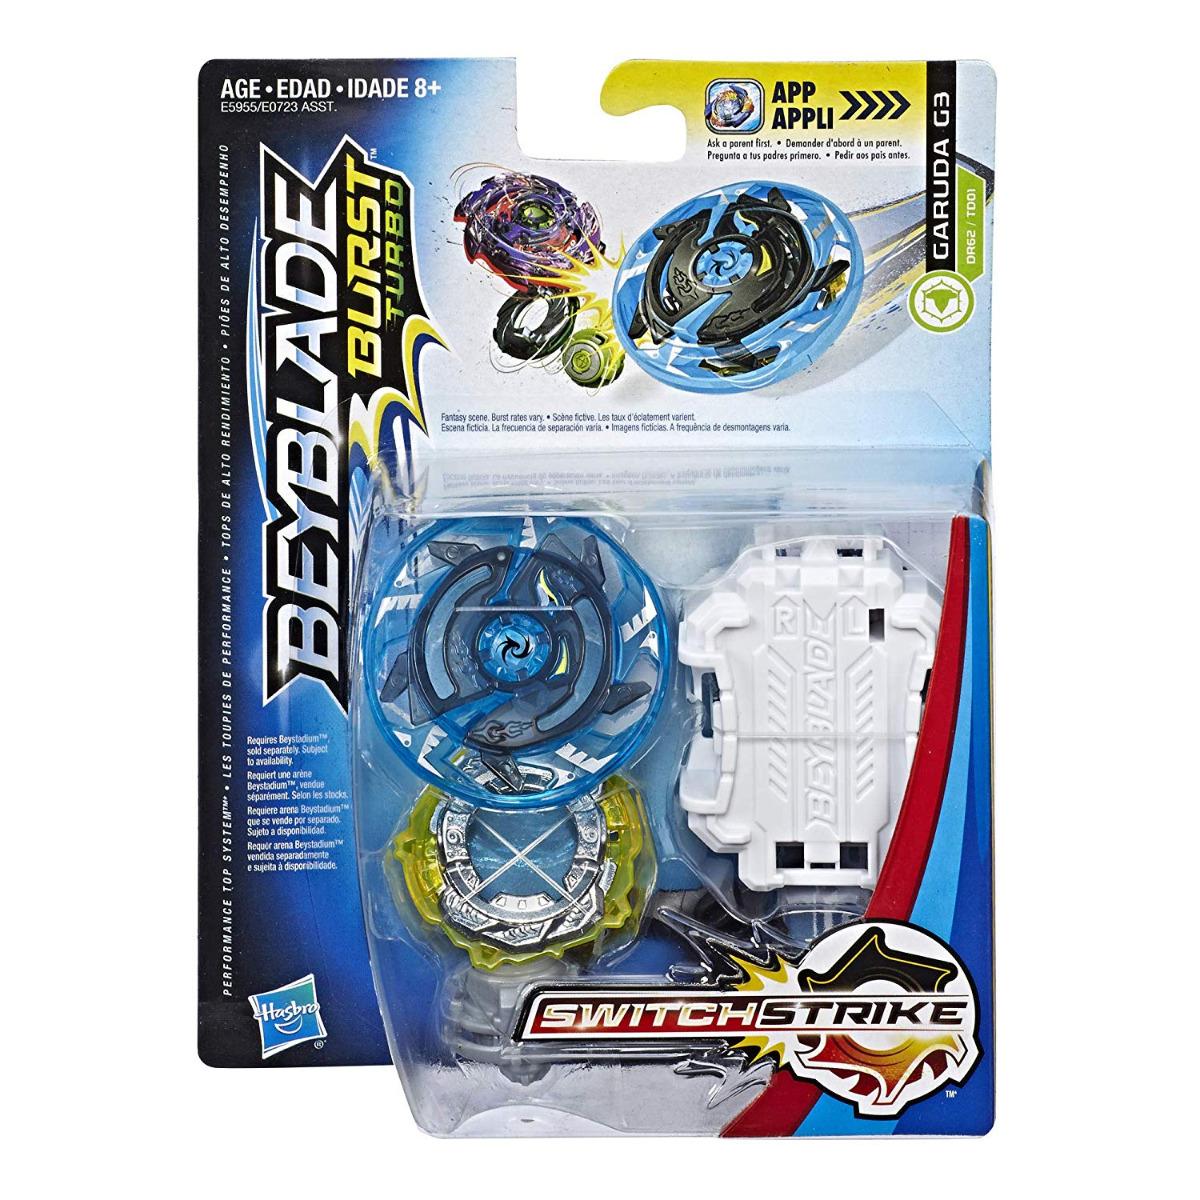 Details about REAL Hasbro Beyblade Burst Turbo SwitchStrike Starter Pack  Garuda G3 Defense